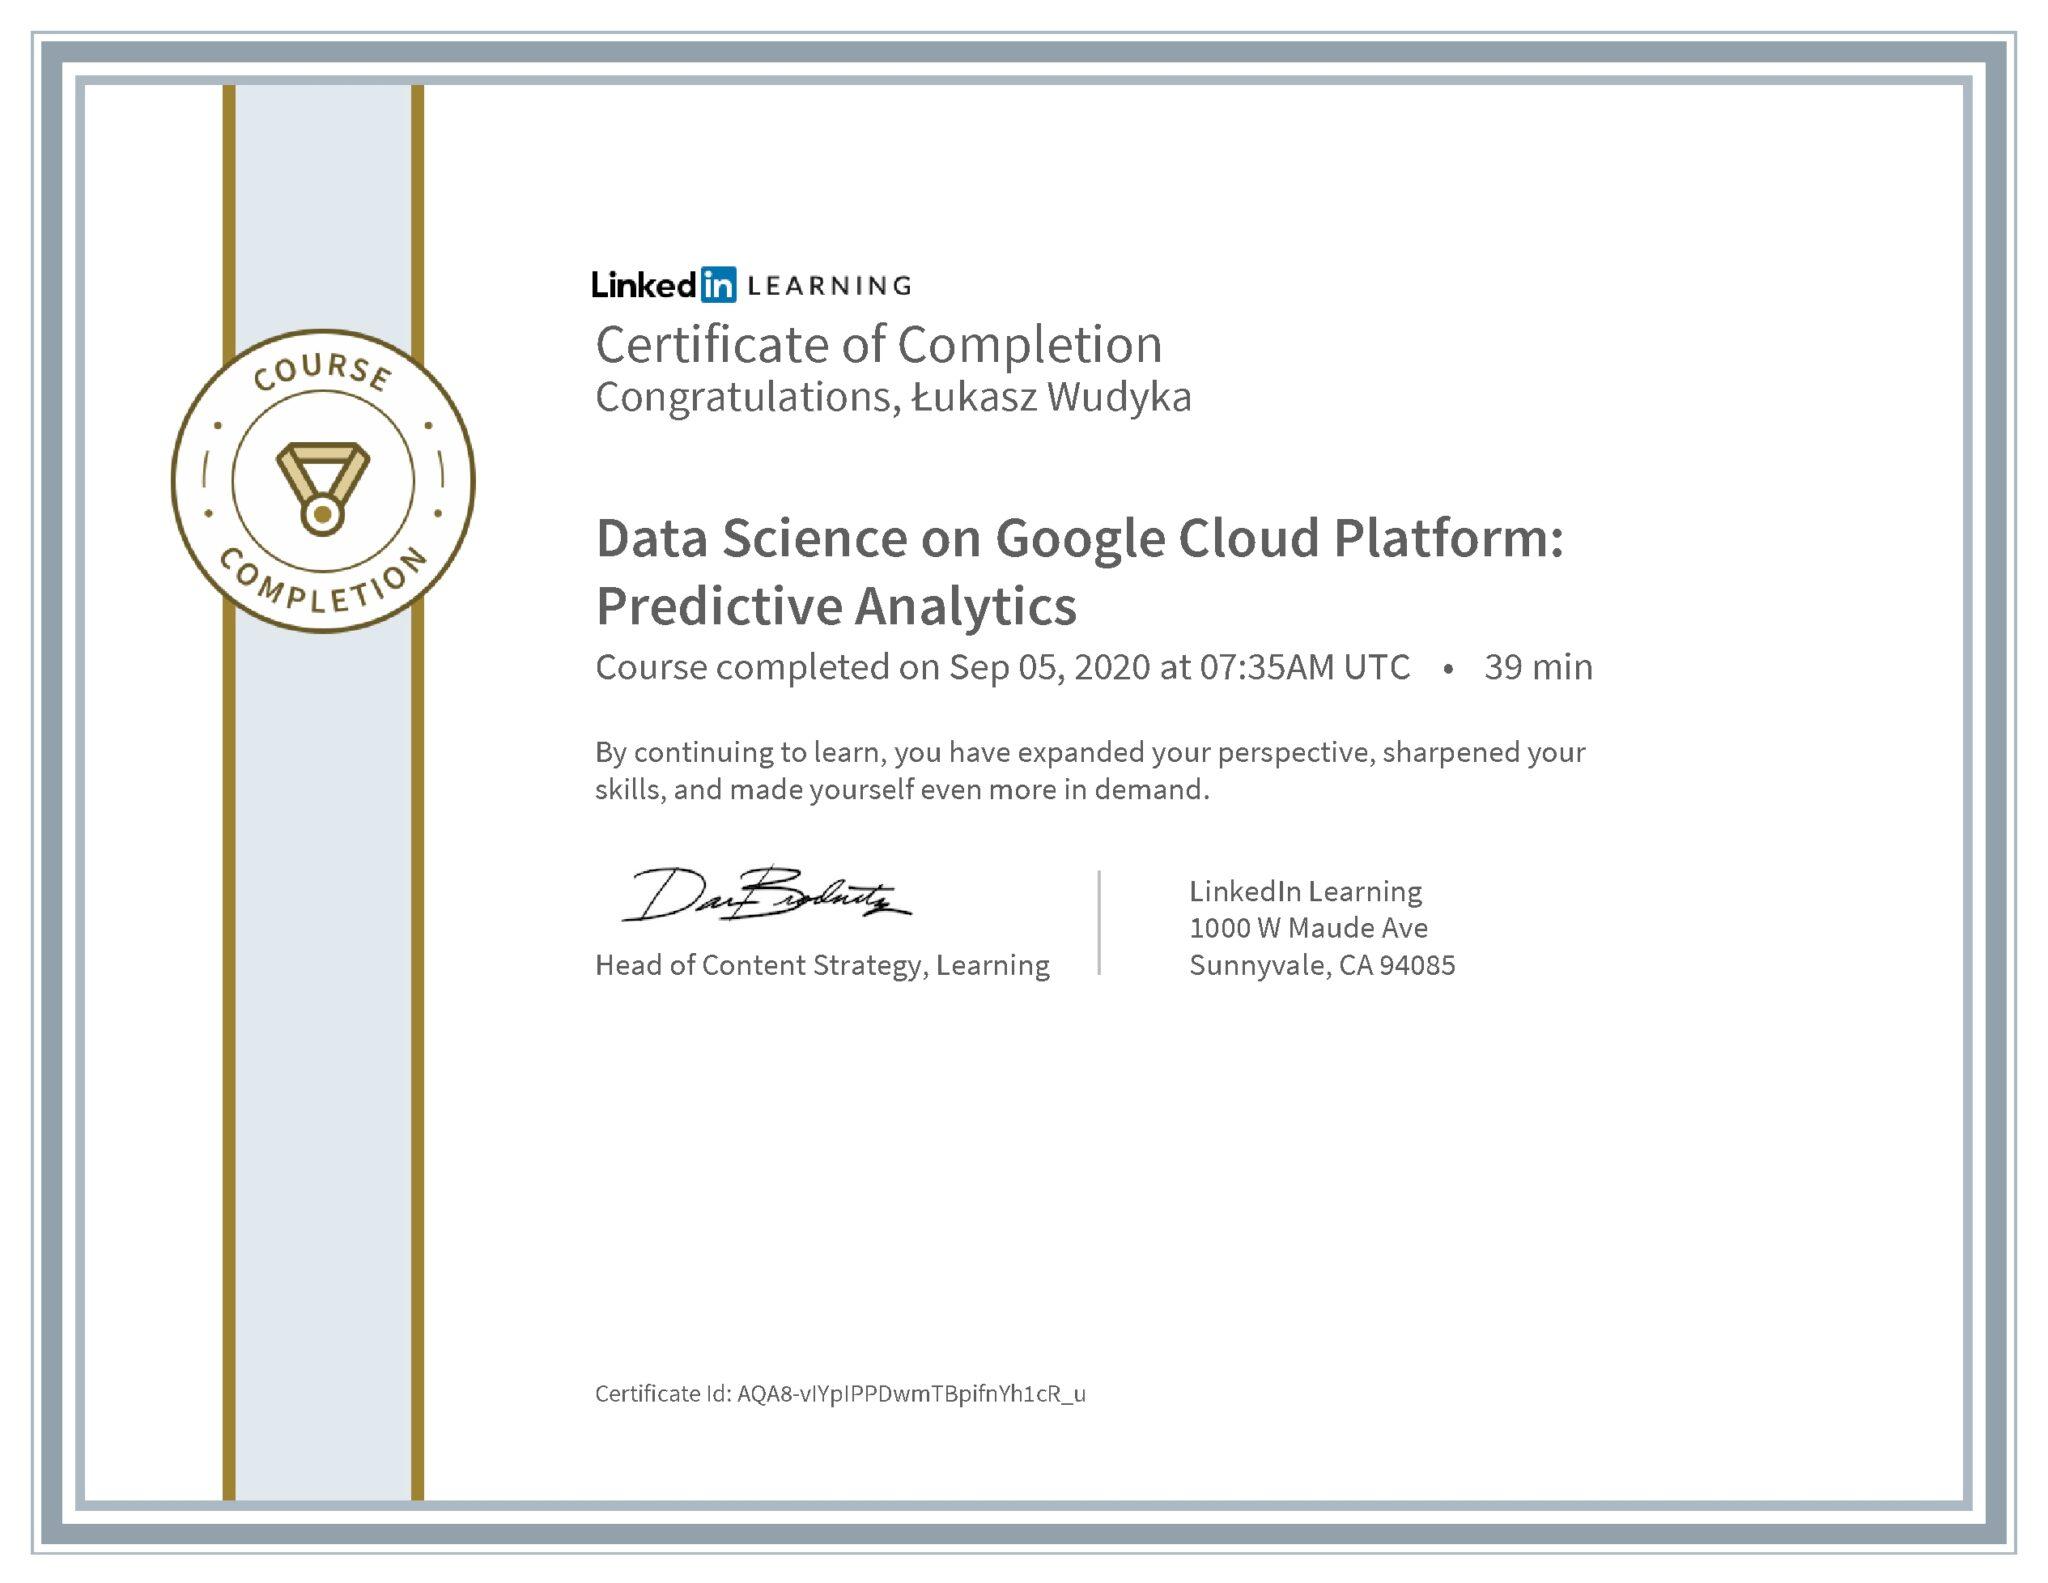 Łukasz Wudyka certyfikat LinkedIn Data Science on Google Cloud Platform: Predictive Analytics